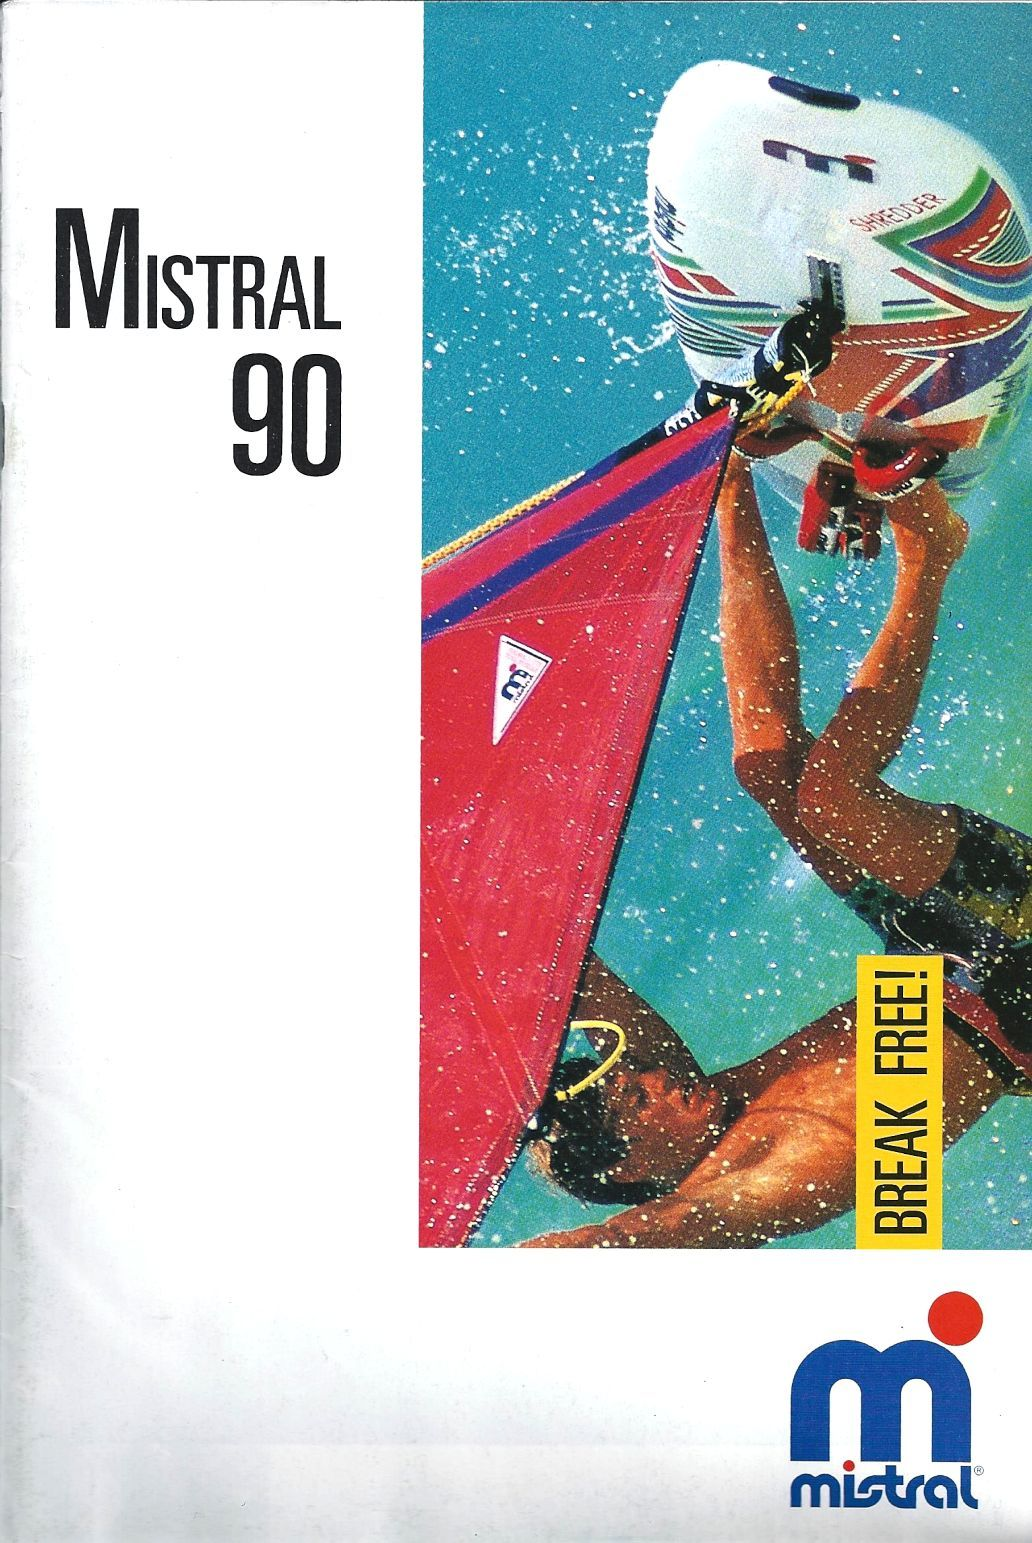 HitthewaveFilesWordpressCom   MistralWindsurfing